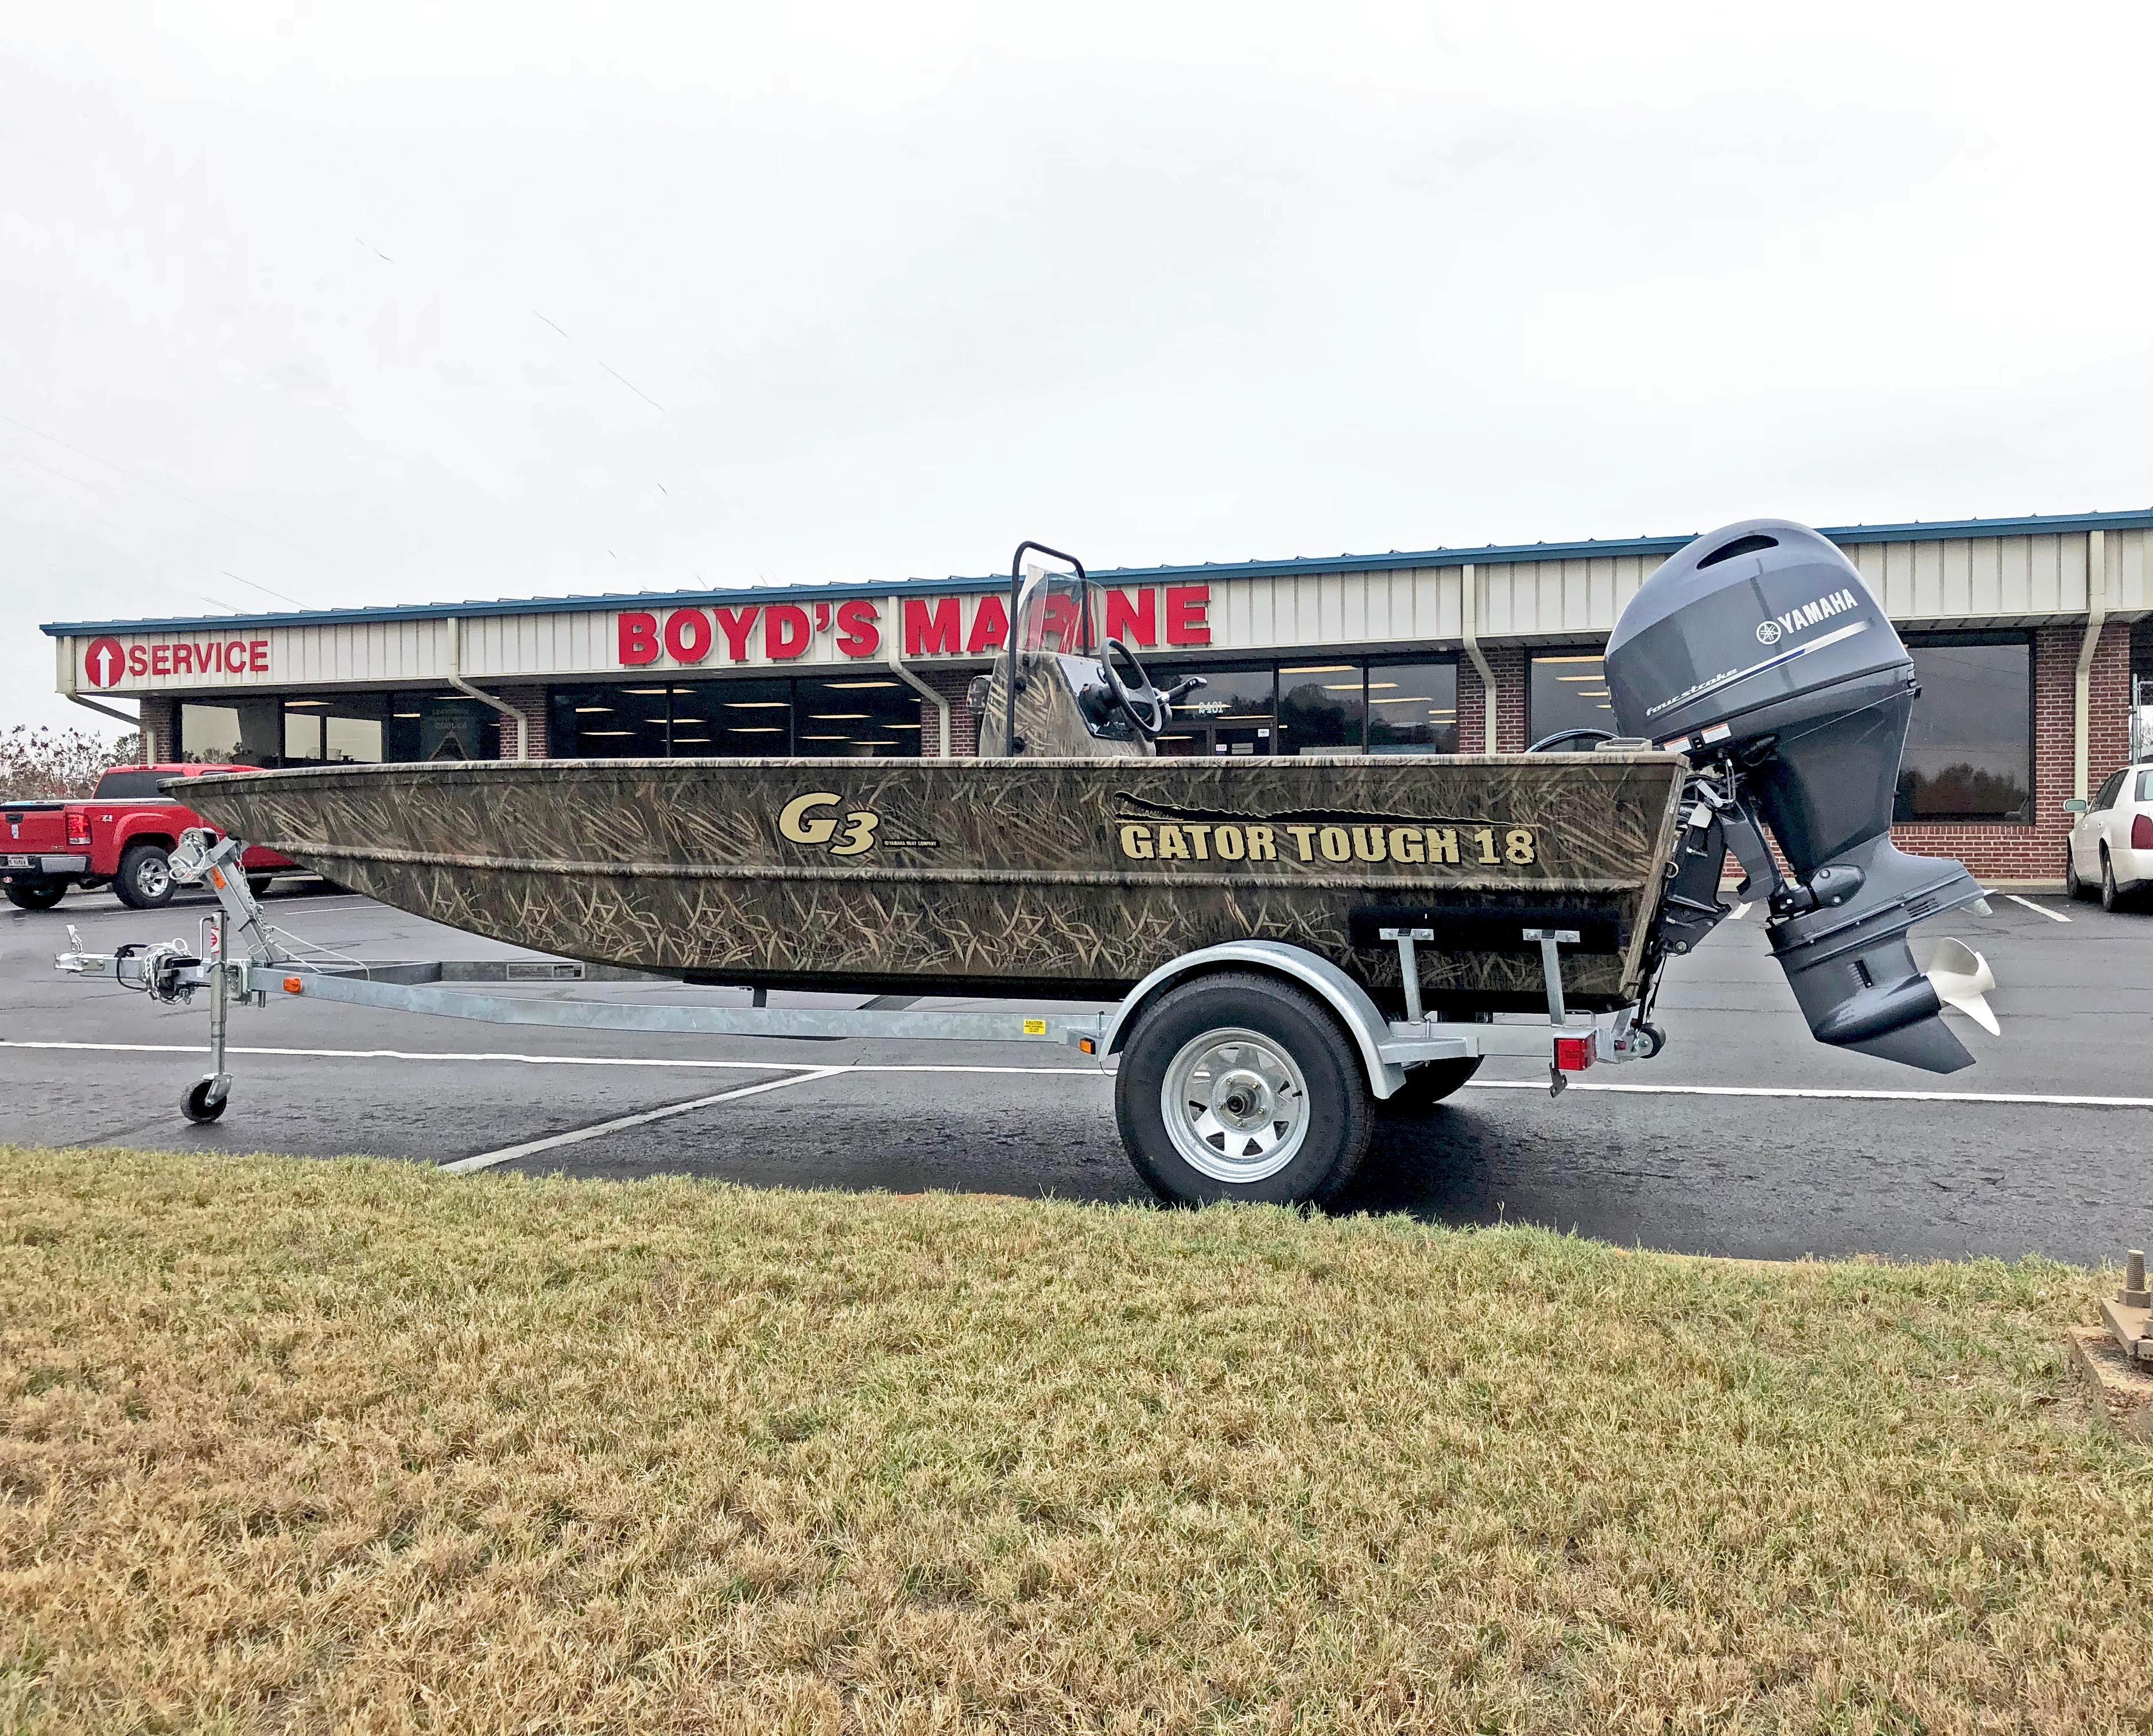 2018 G3 Gator Tough 18 CC Boyds Marine in Dothan Alabama